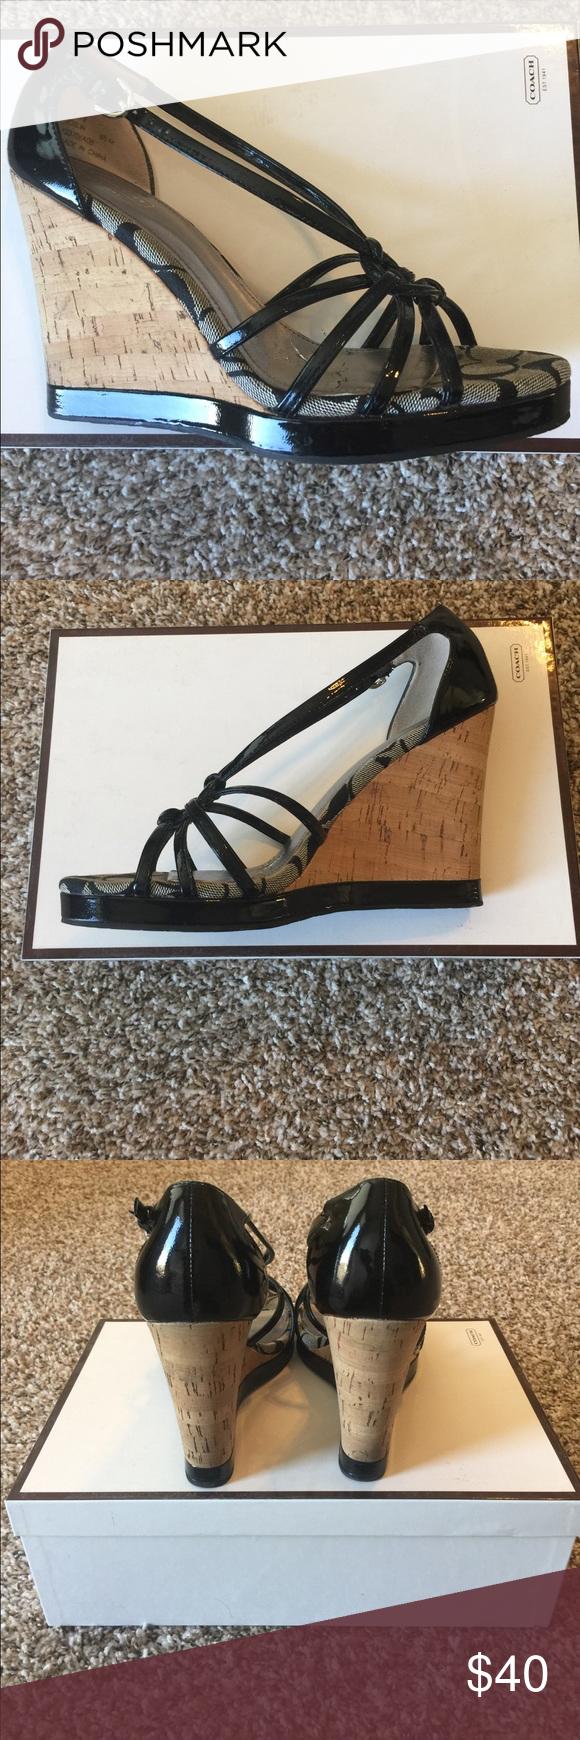 Coach black patent wedges-size 8.5 Coach black patent wedges-size 8.5 worn/good condition Coach Shoes Wedges